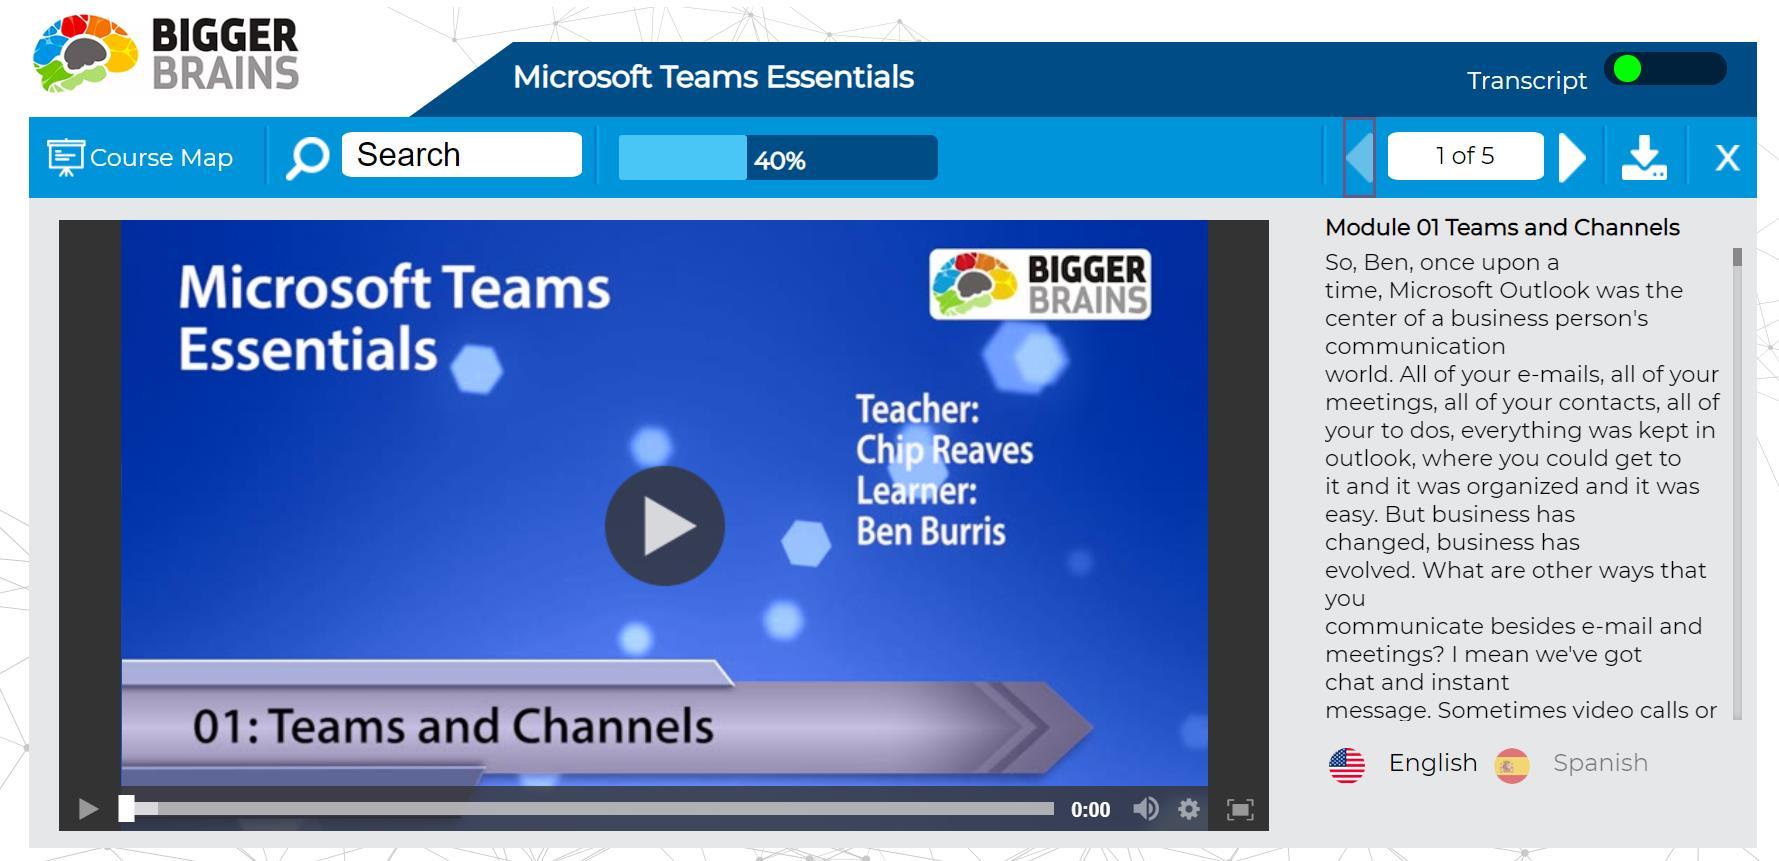 Microsoft-Teams-Essentials.jpg